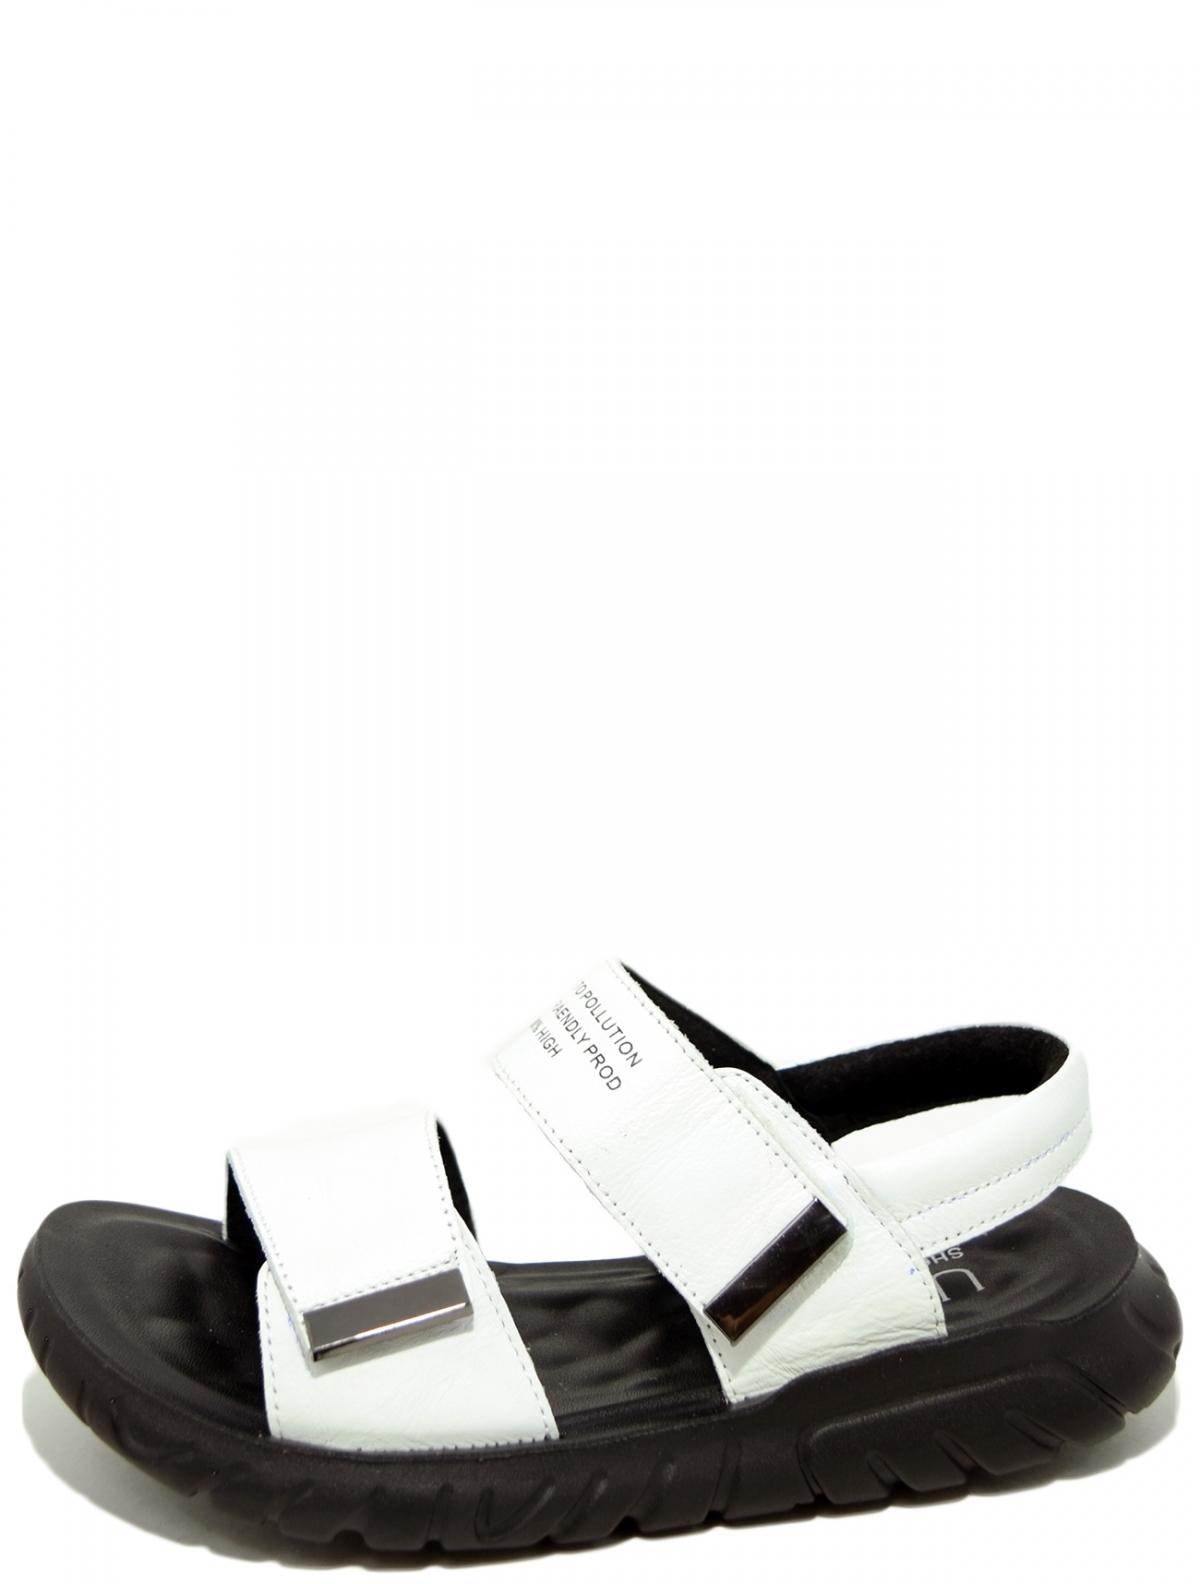 Ulet 1003-7 сандали для мальчика